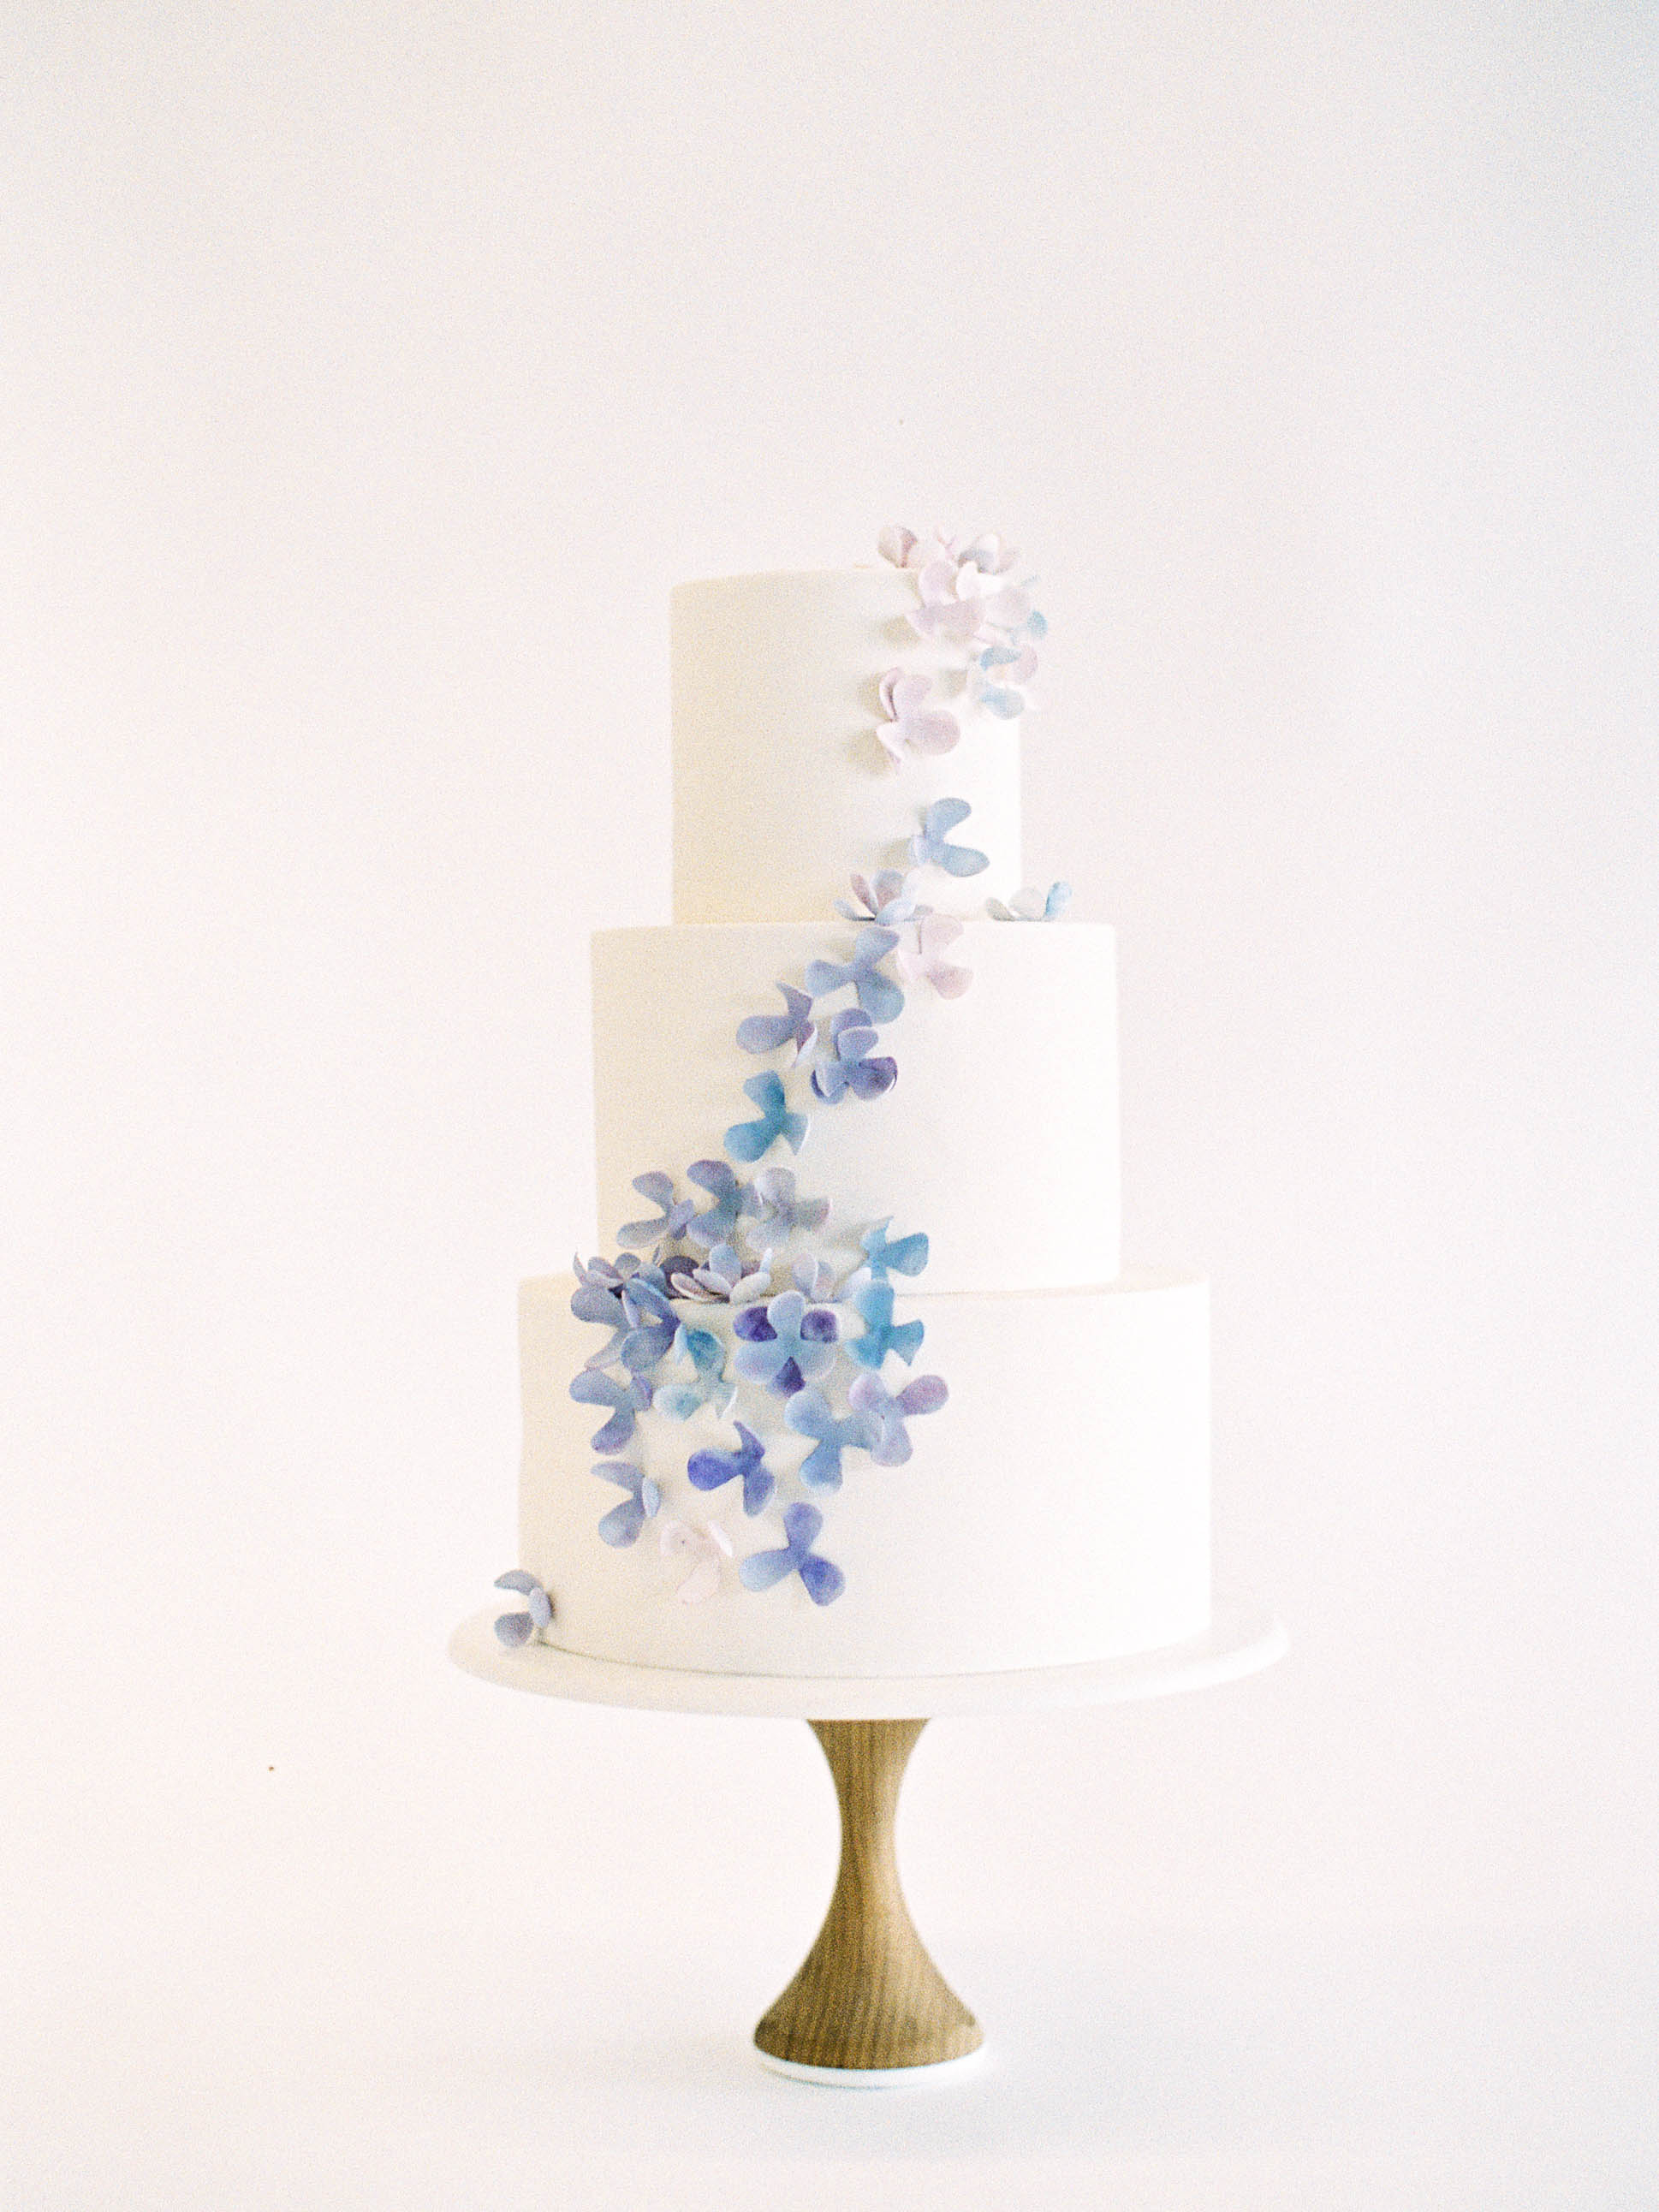 Delicate Cakes - Nine Cakes